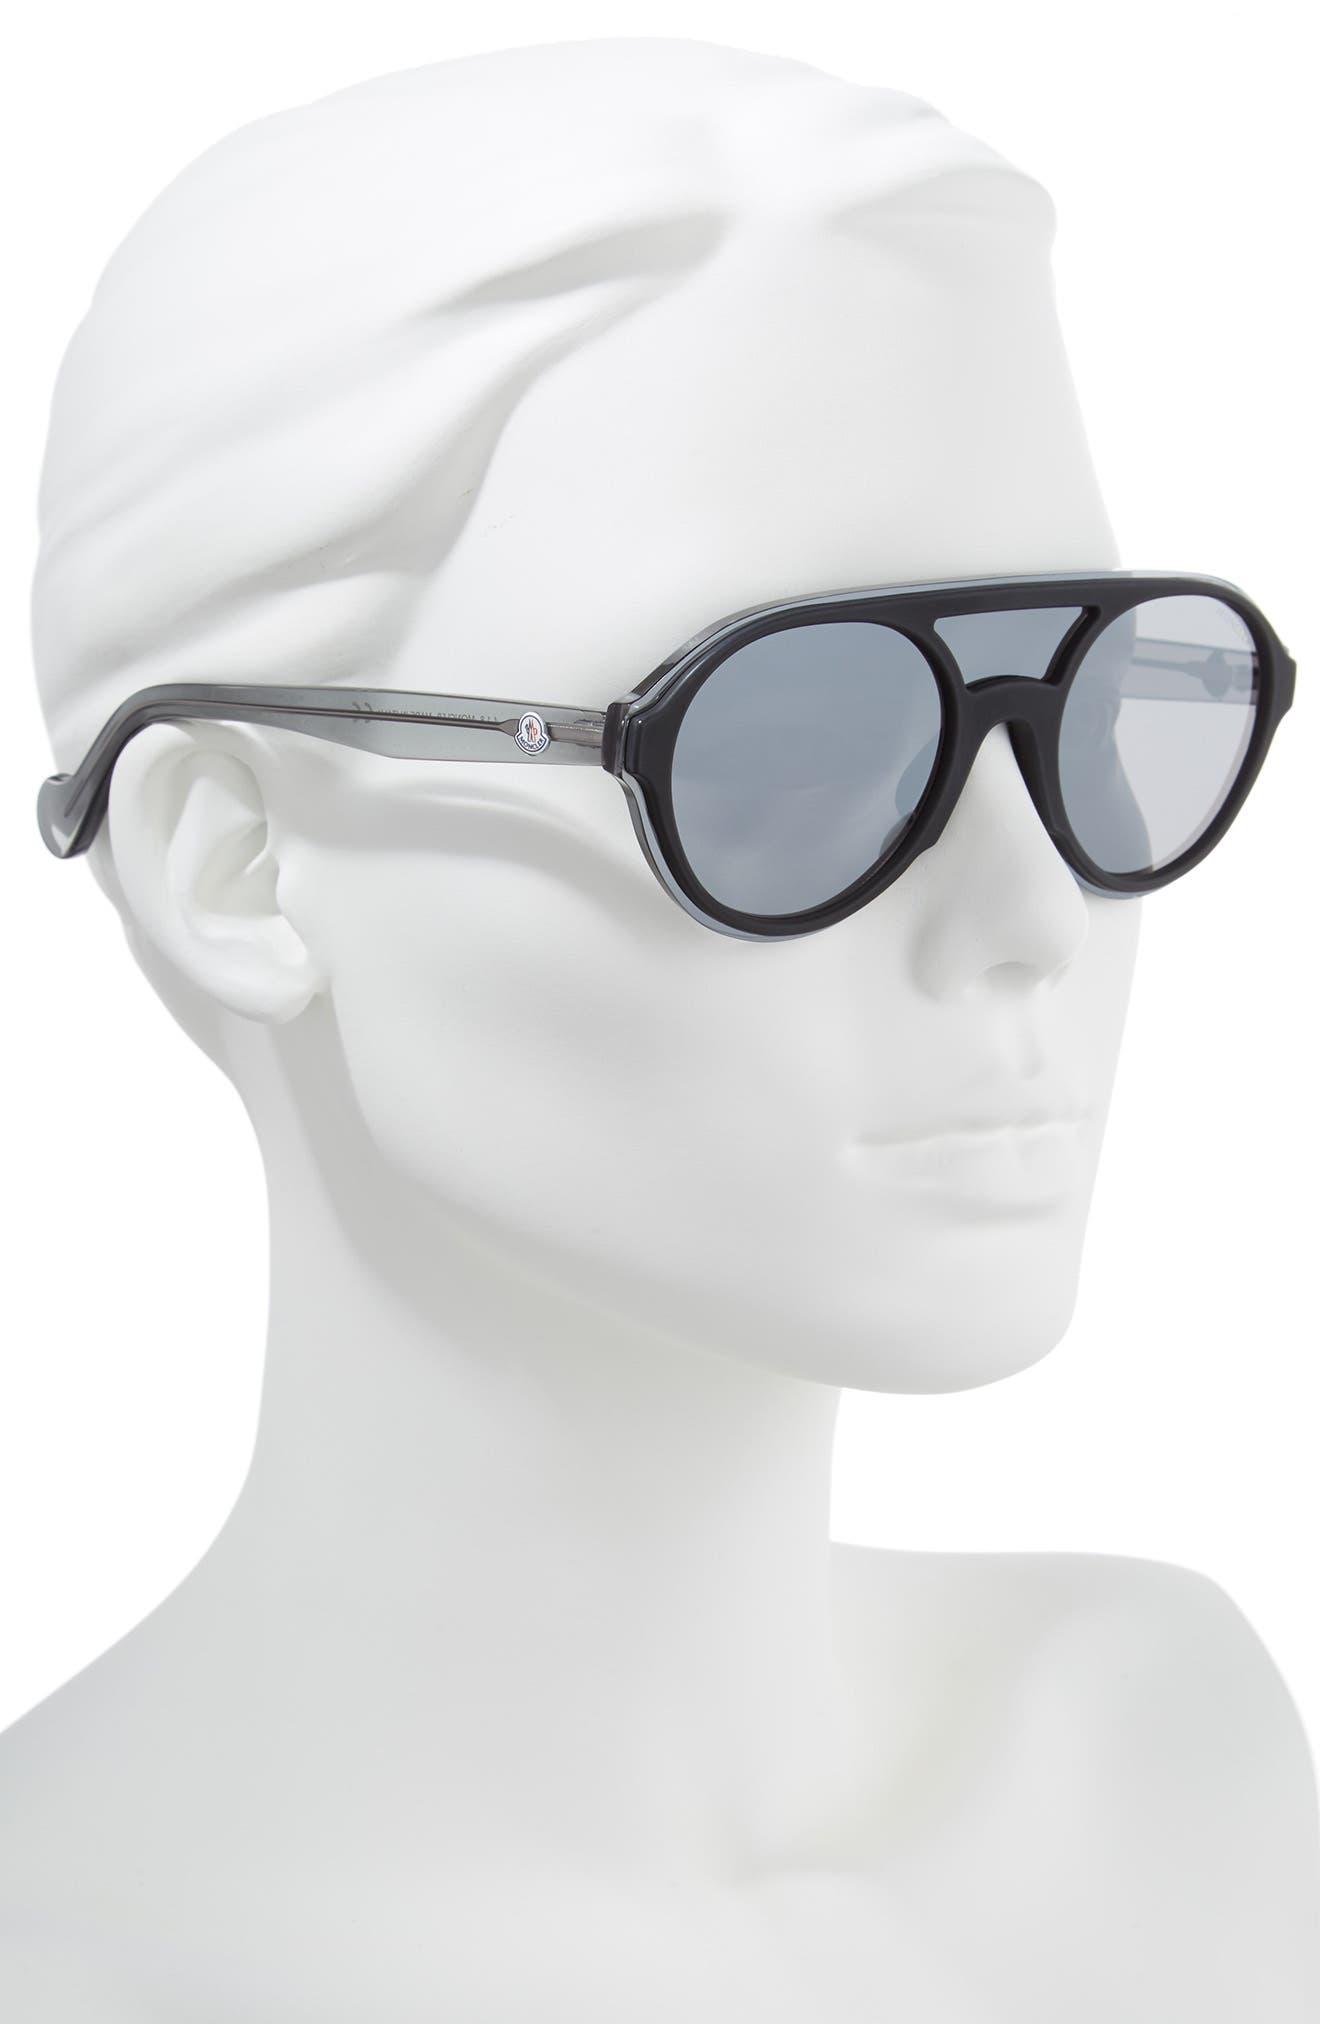 8e1493a62c6 Moncler Sunglasses for Women